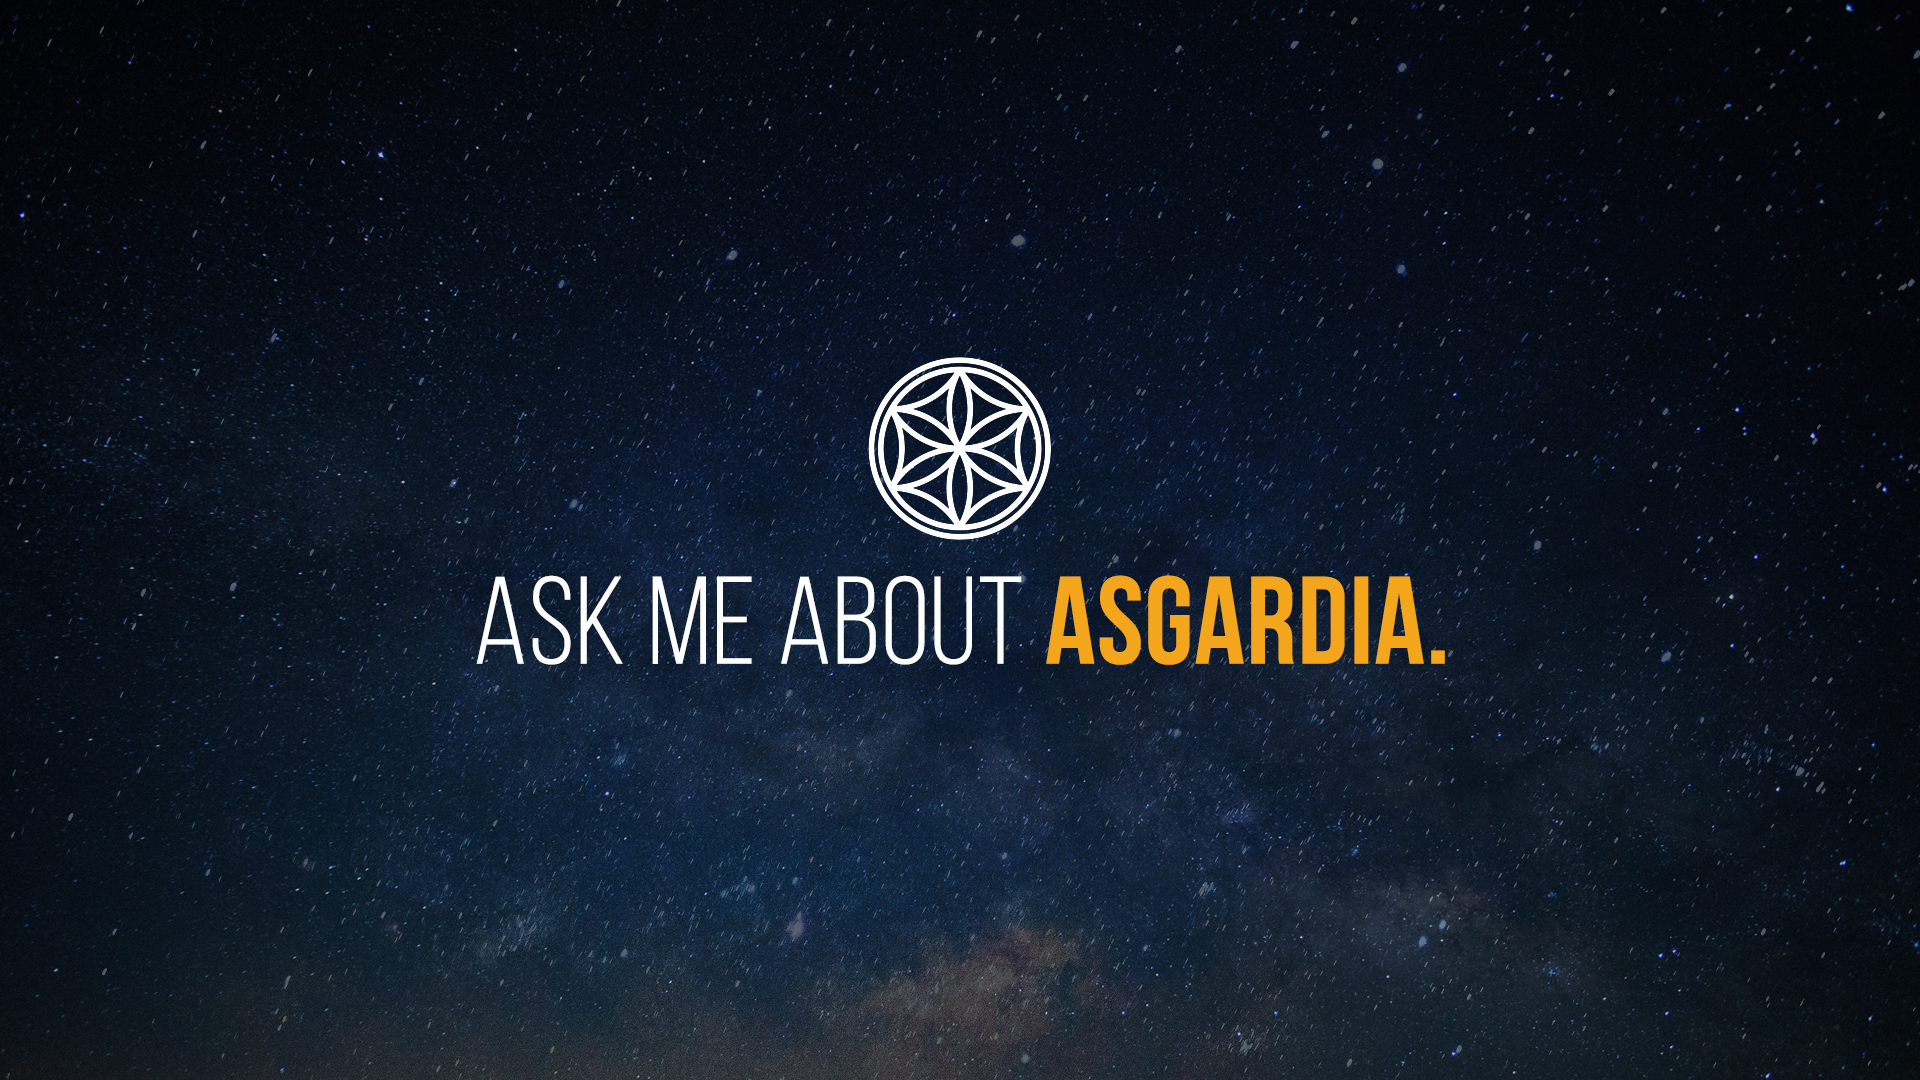 Asgardia – I'm running for Parliament!